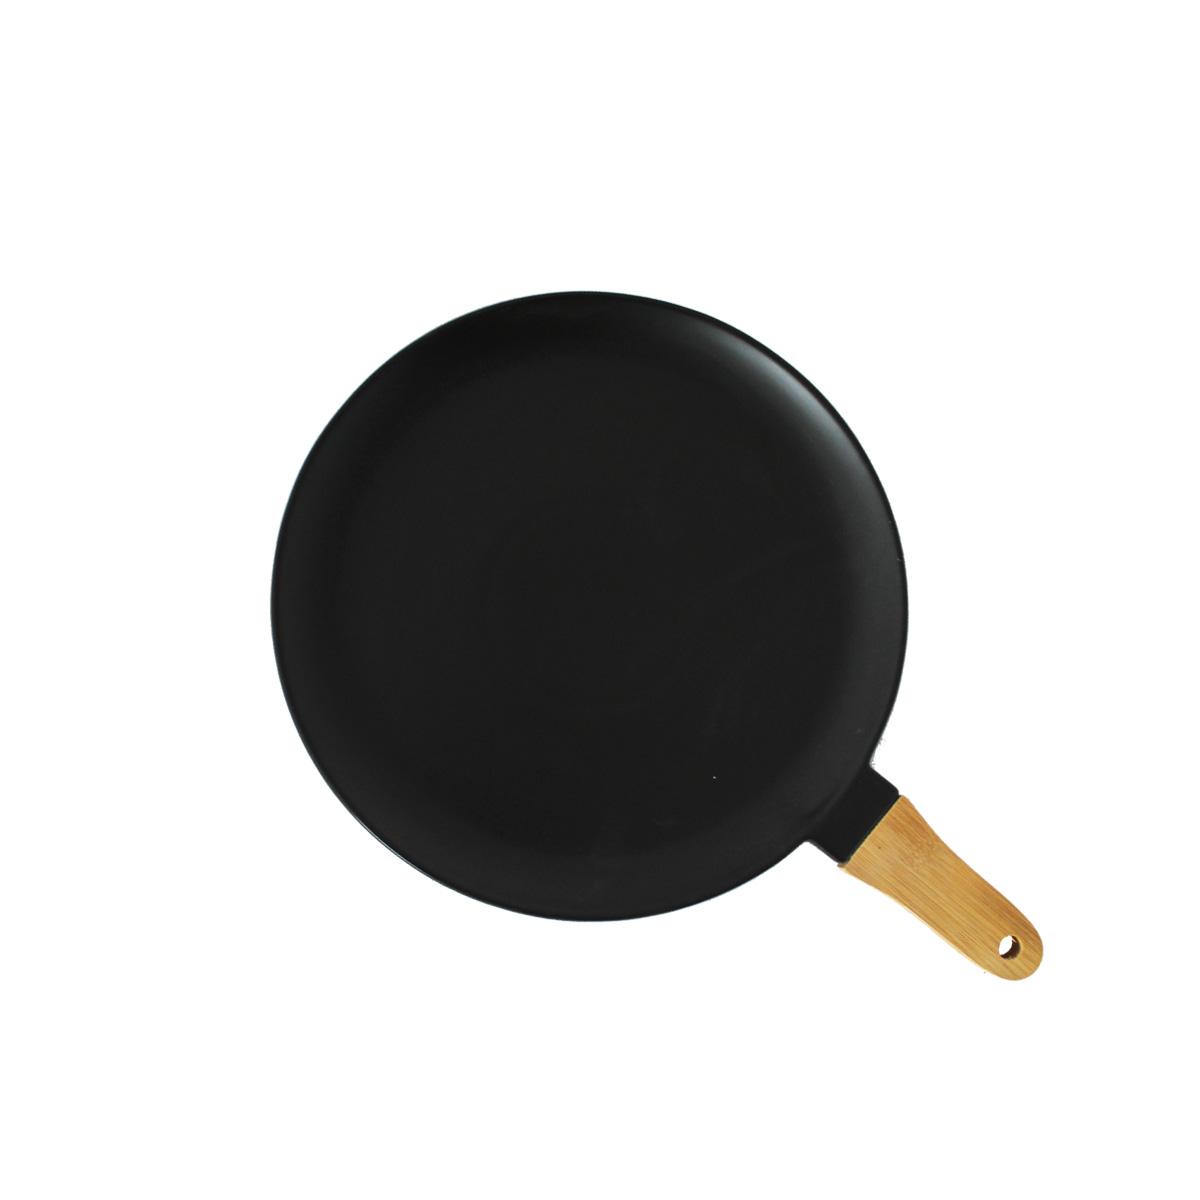 Keramički tanjir sa drvenom drškom  M  MUS-059